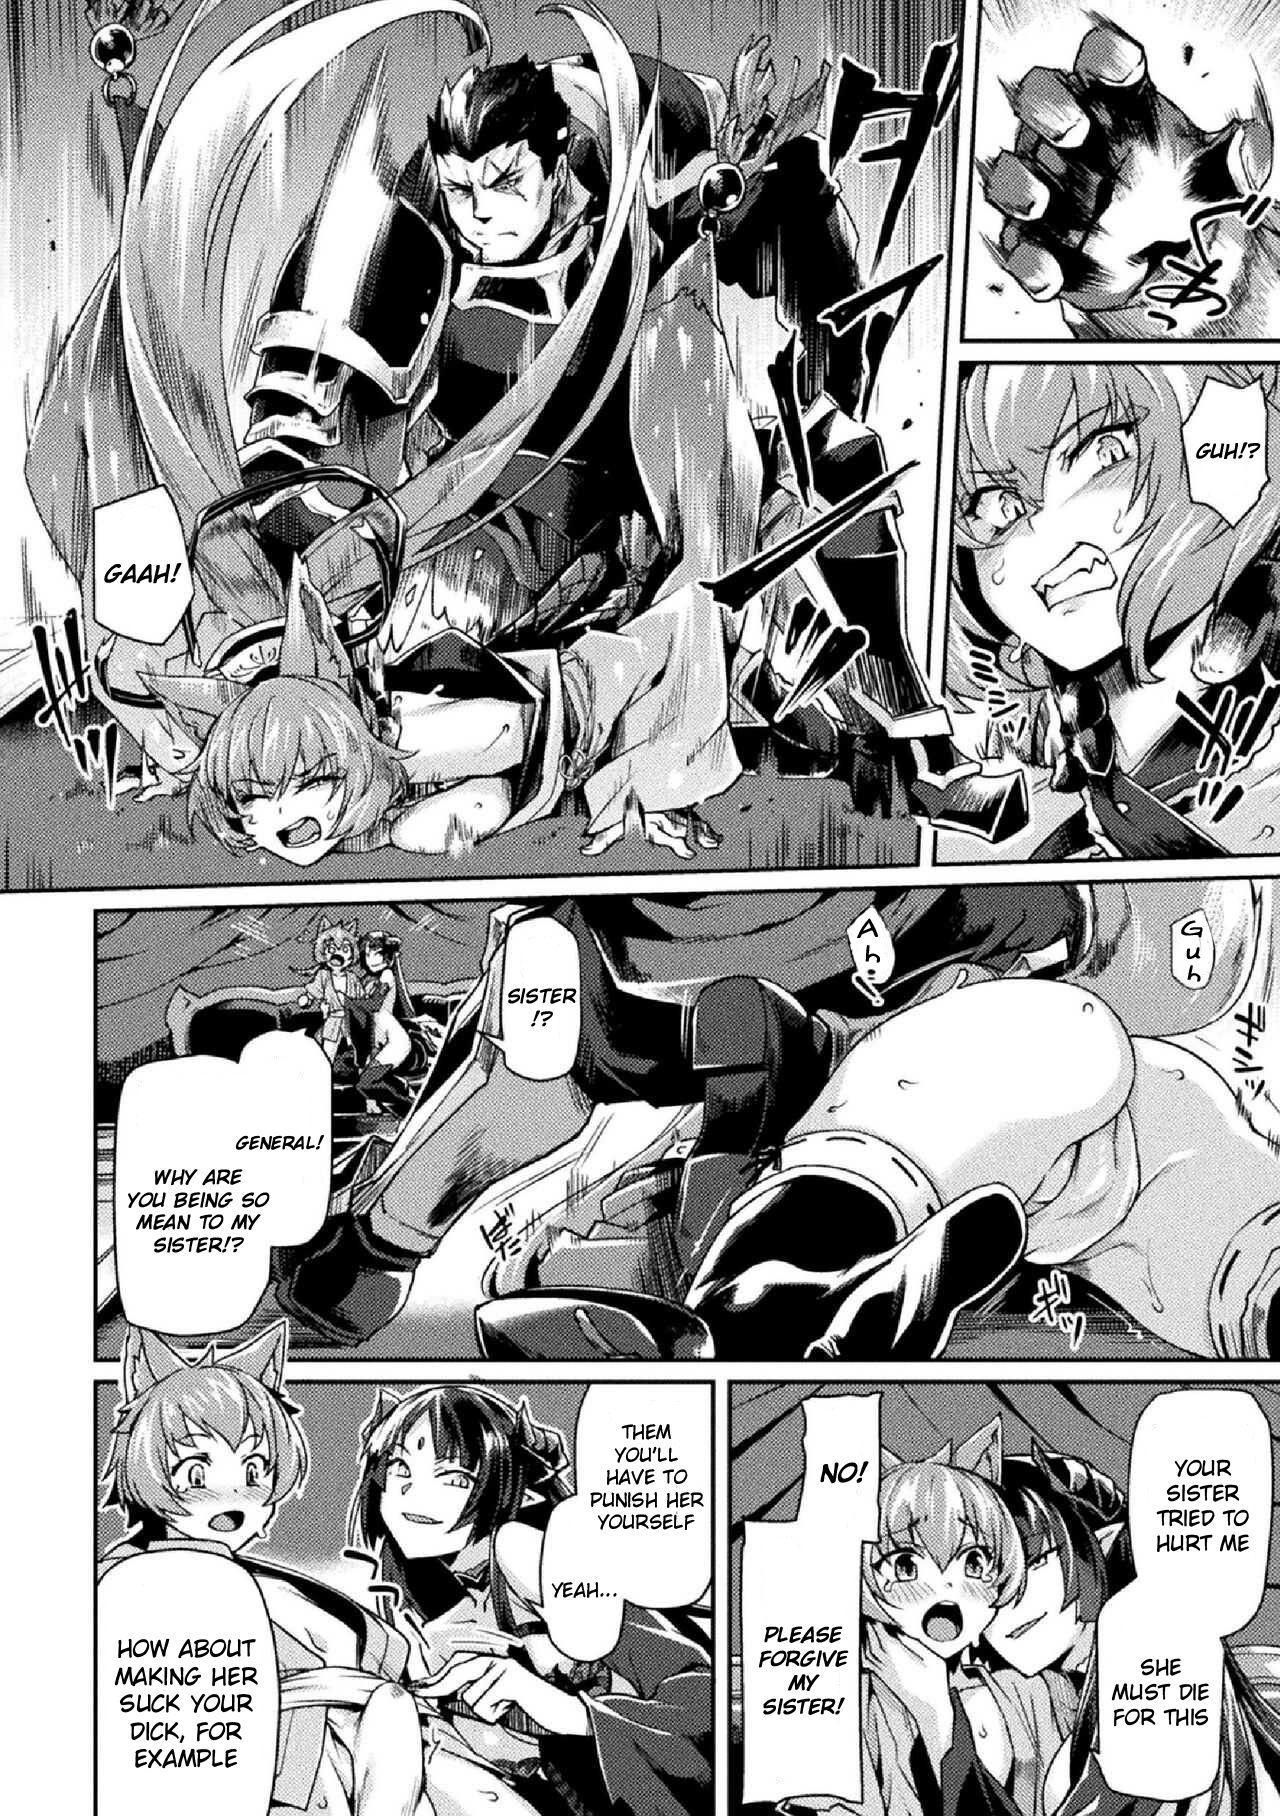 [Tsukitokage] Kuroinu II ~Inyoku ni Somaru Haitoku no Miyako, Futatabi~ THE COMIC Ch. 5 (Kukkoro Heroines Vol. 5) [English] [Klub Kemoner] [Decensored] [Digital] 3